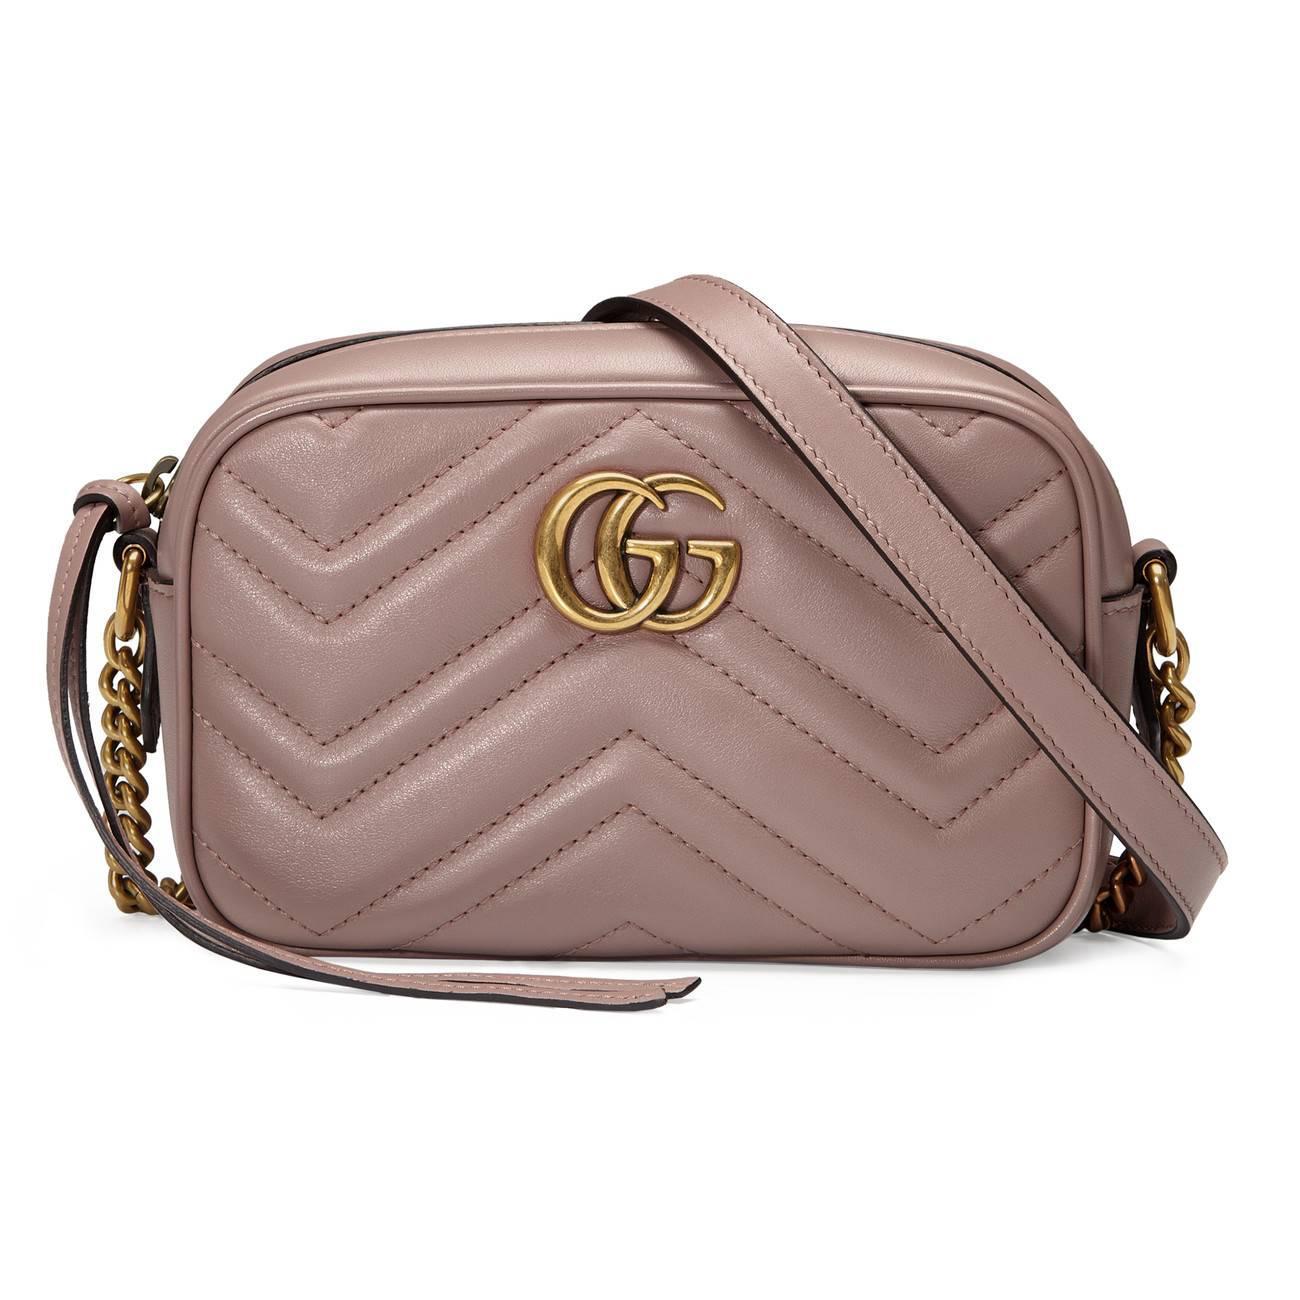 e8b6b29d51f Gucci GG Marmont Small Matelassé Shoulder Bag in Pink - Save 29% - Lyst